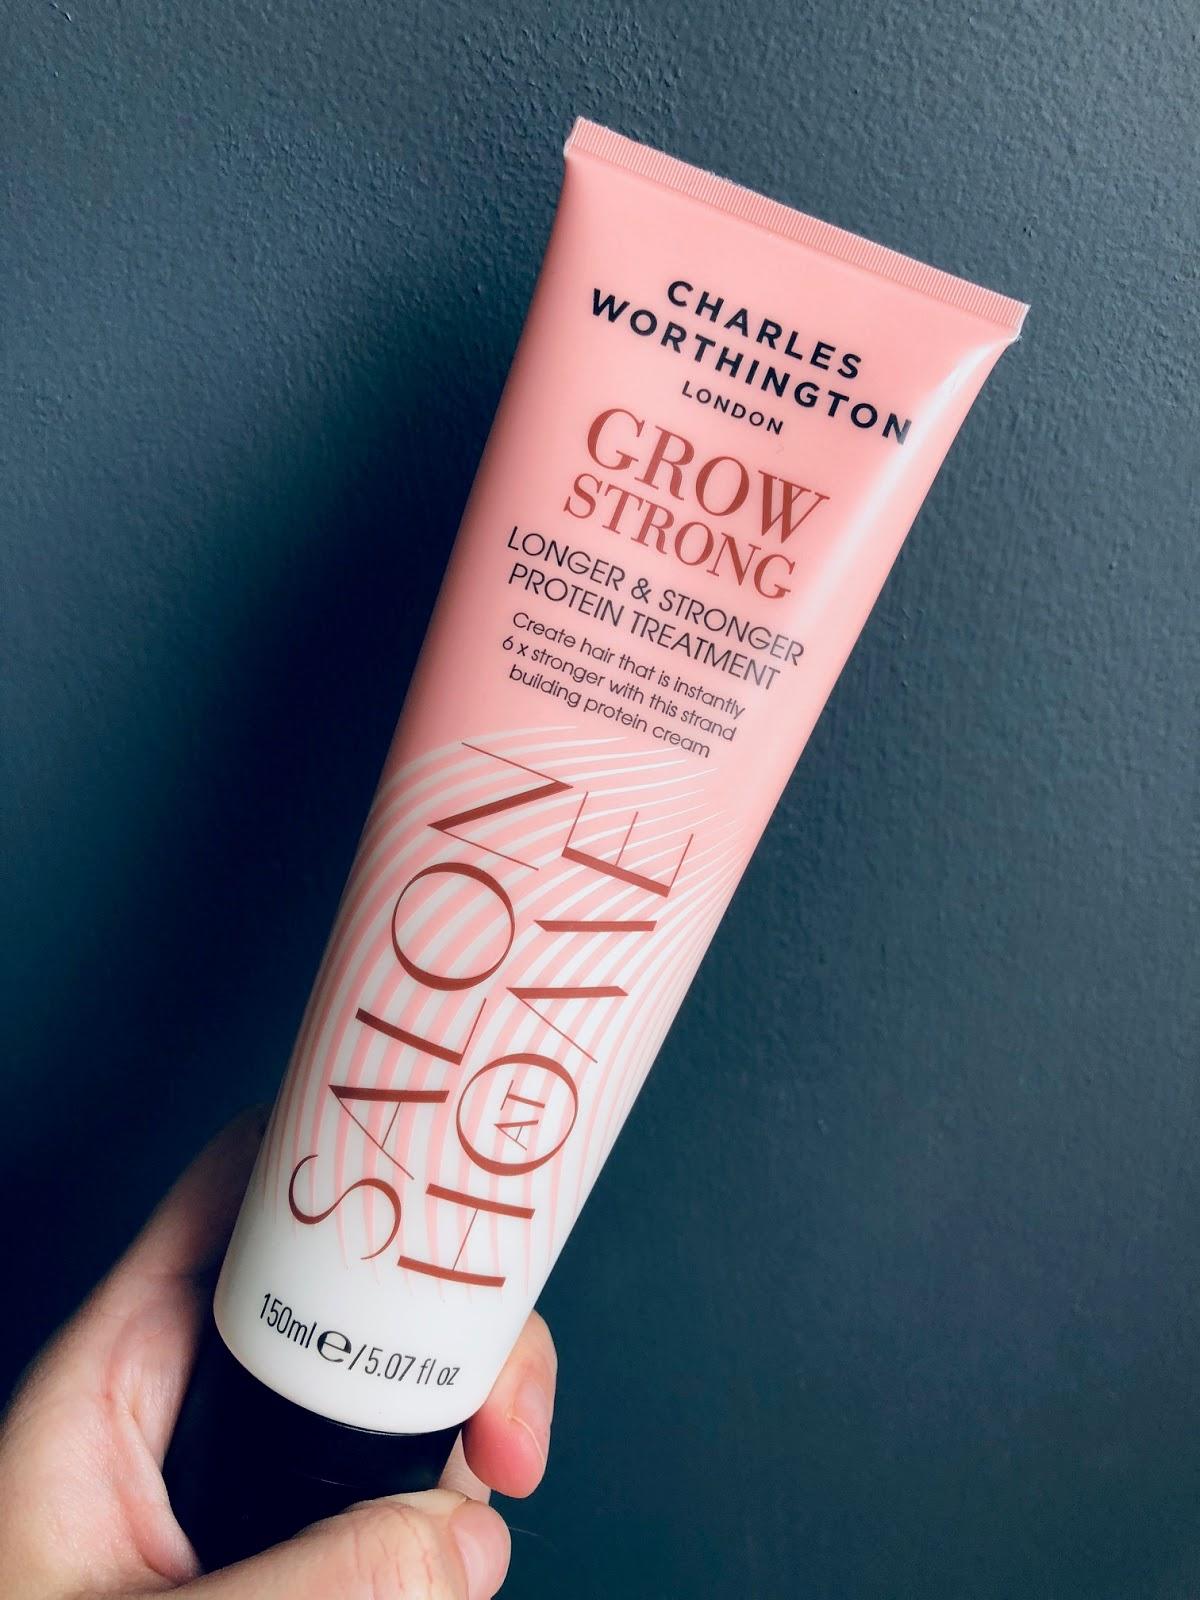 Viva Acne Lotion 30ml Charles Worthington Grow Strong Protein Treatment